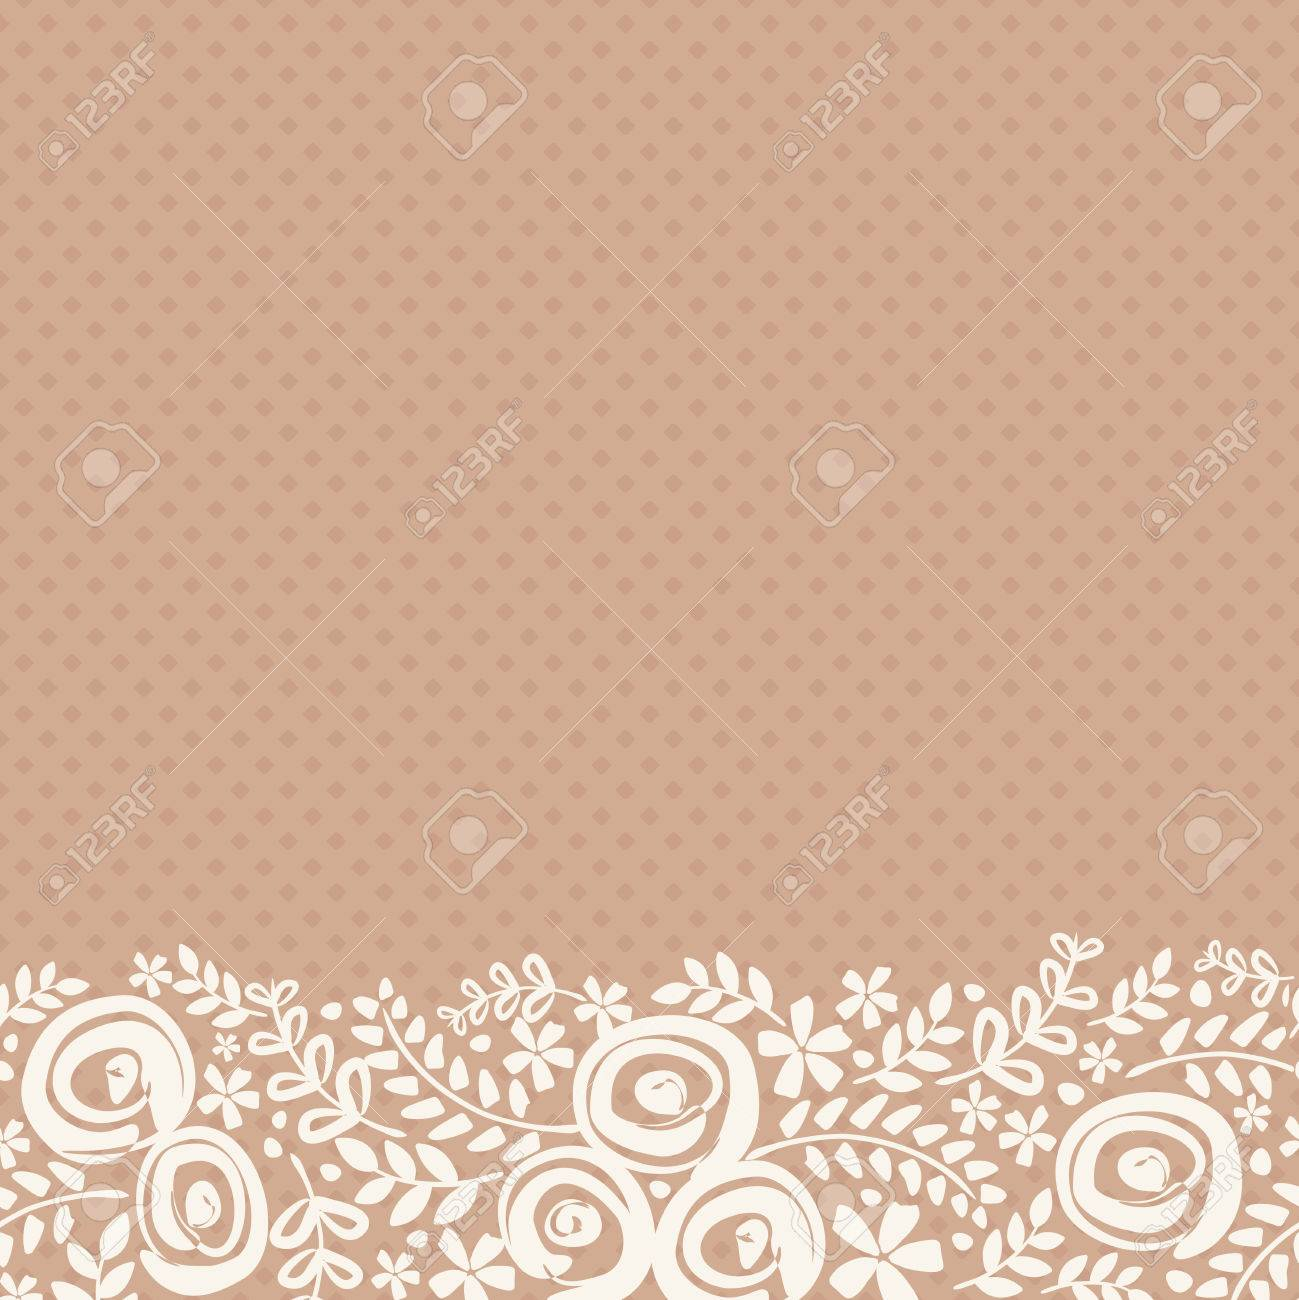 abstrakt natur muster mit pflanzen blumen endless muster kann fr tapeten muster fllt - Tapeten Mit Muster